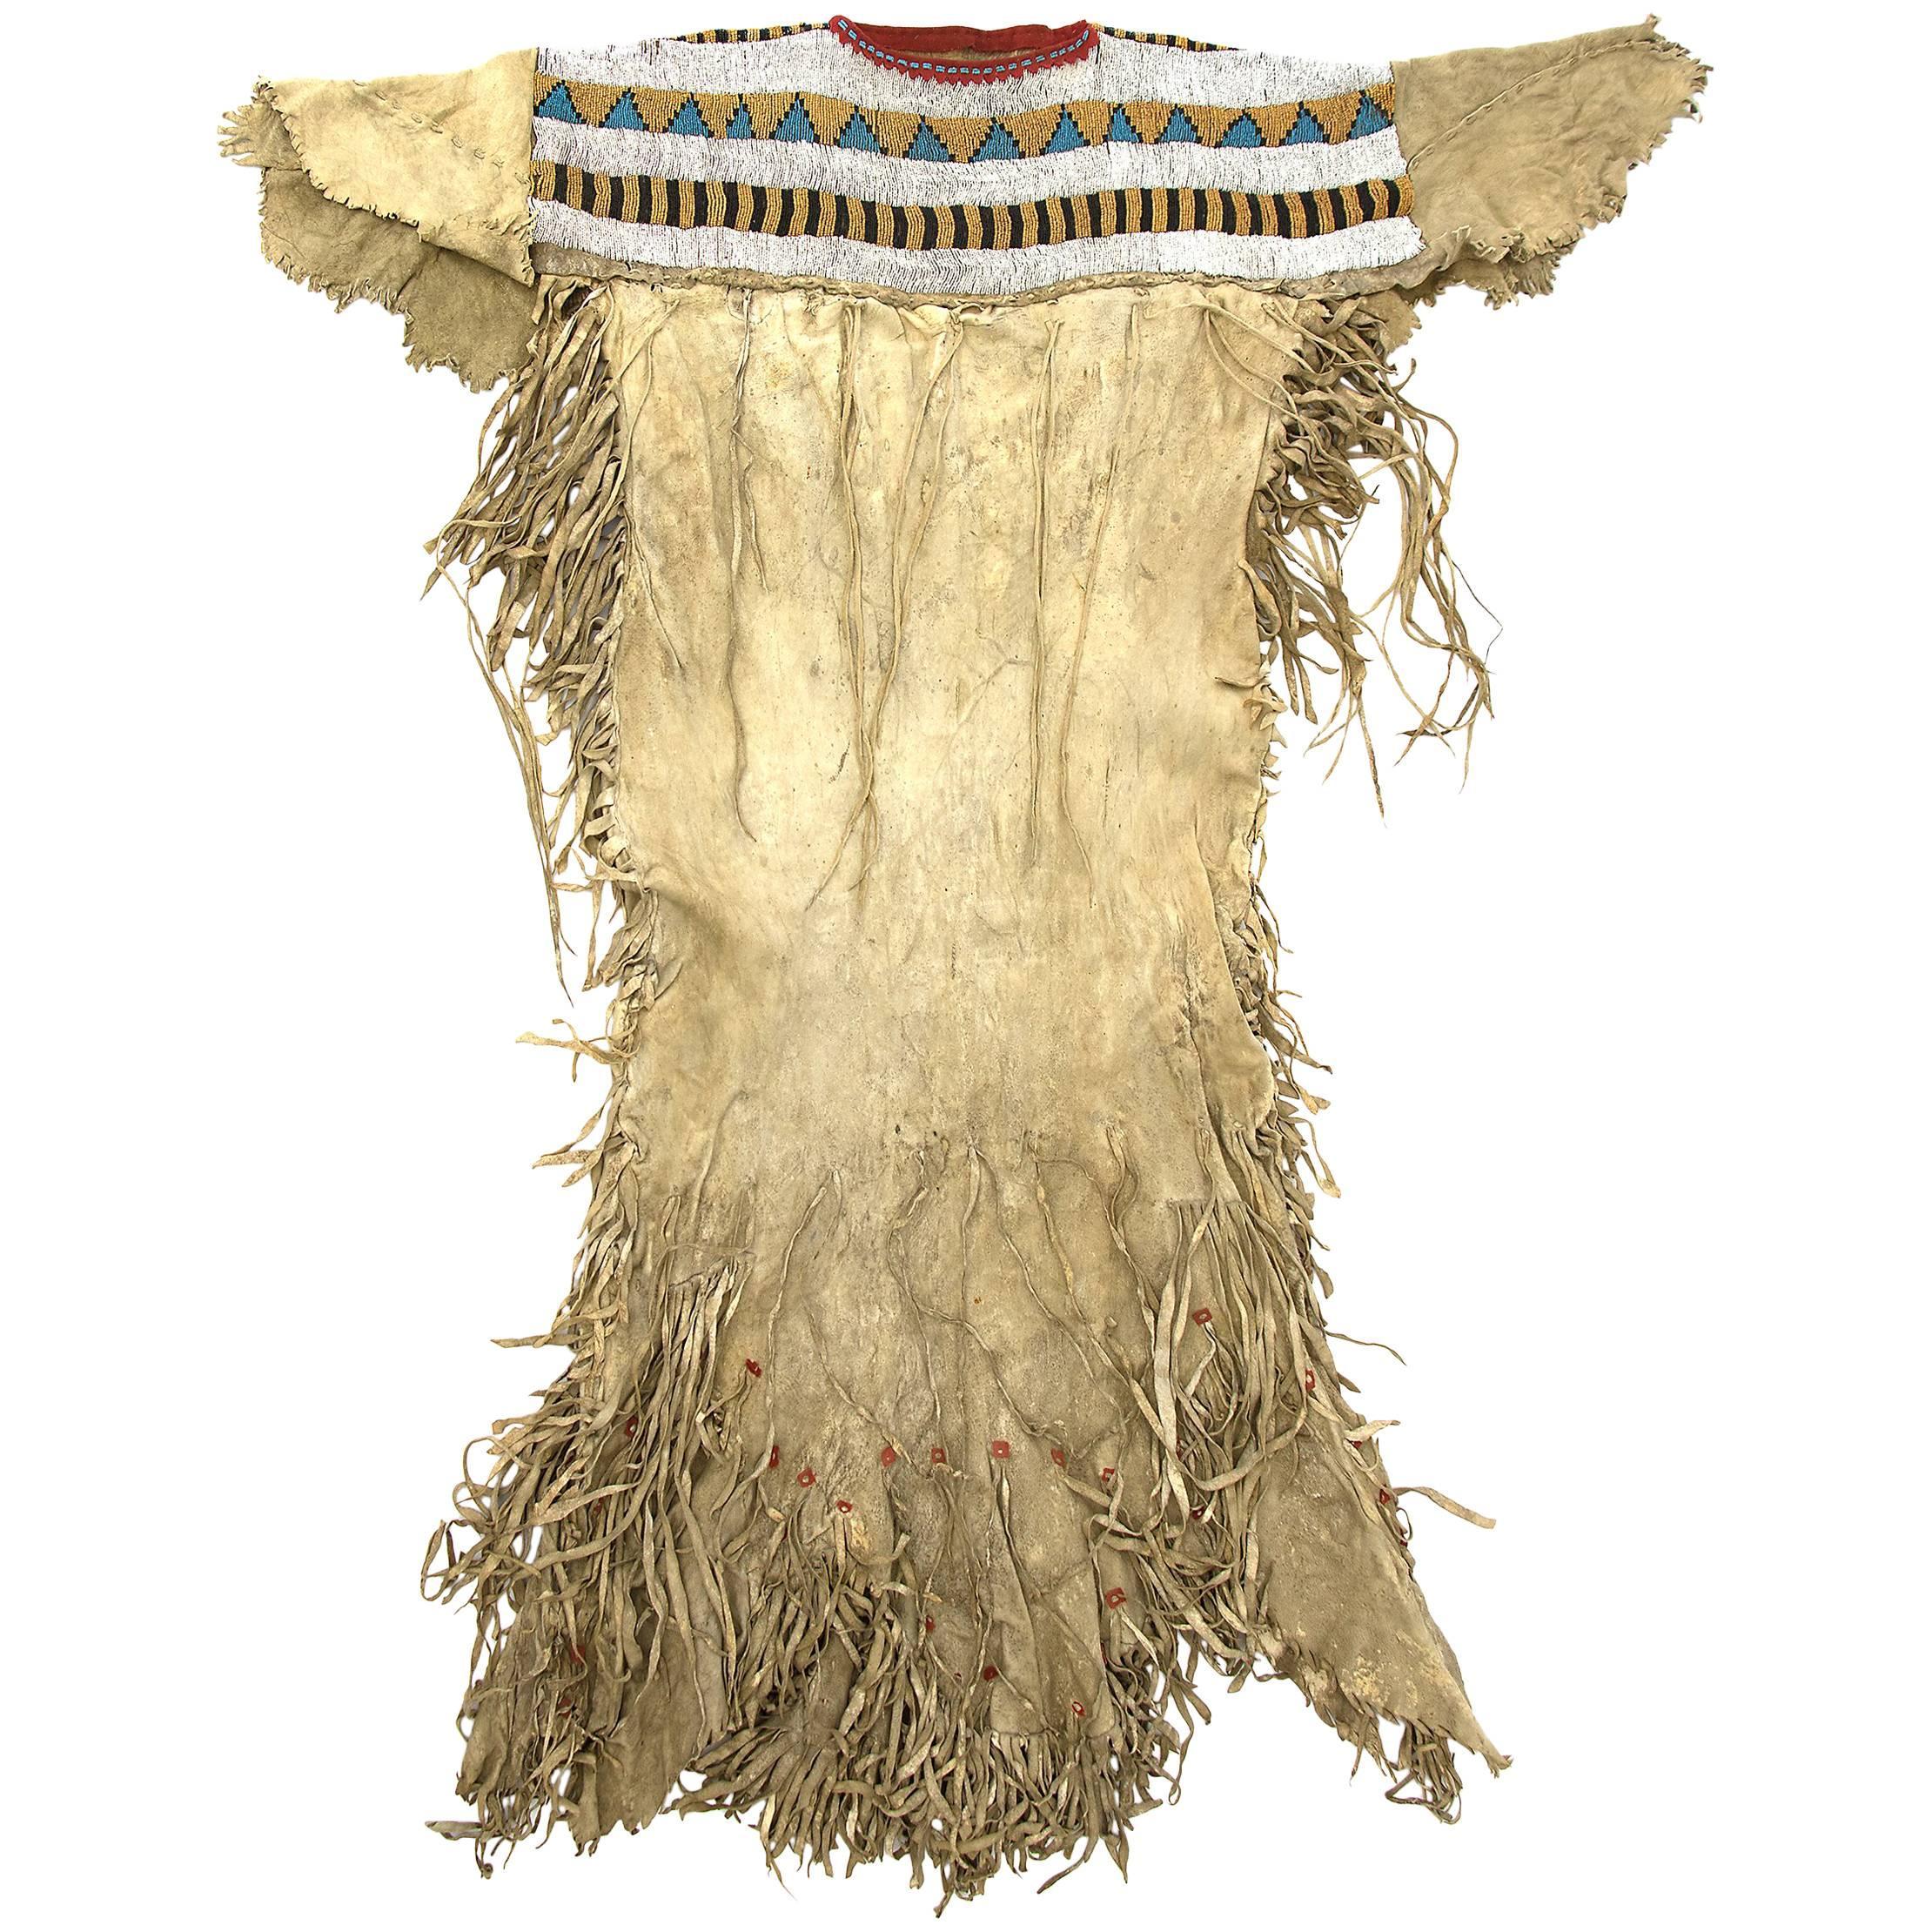 Classic Period Native American Beaded Dress, Blackfeet 'Plains', circa 1860